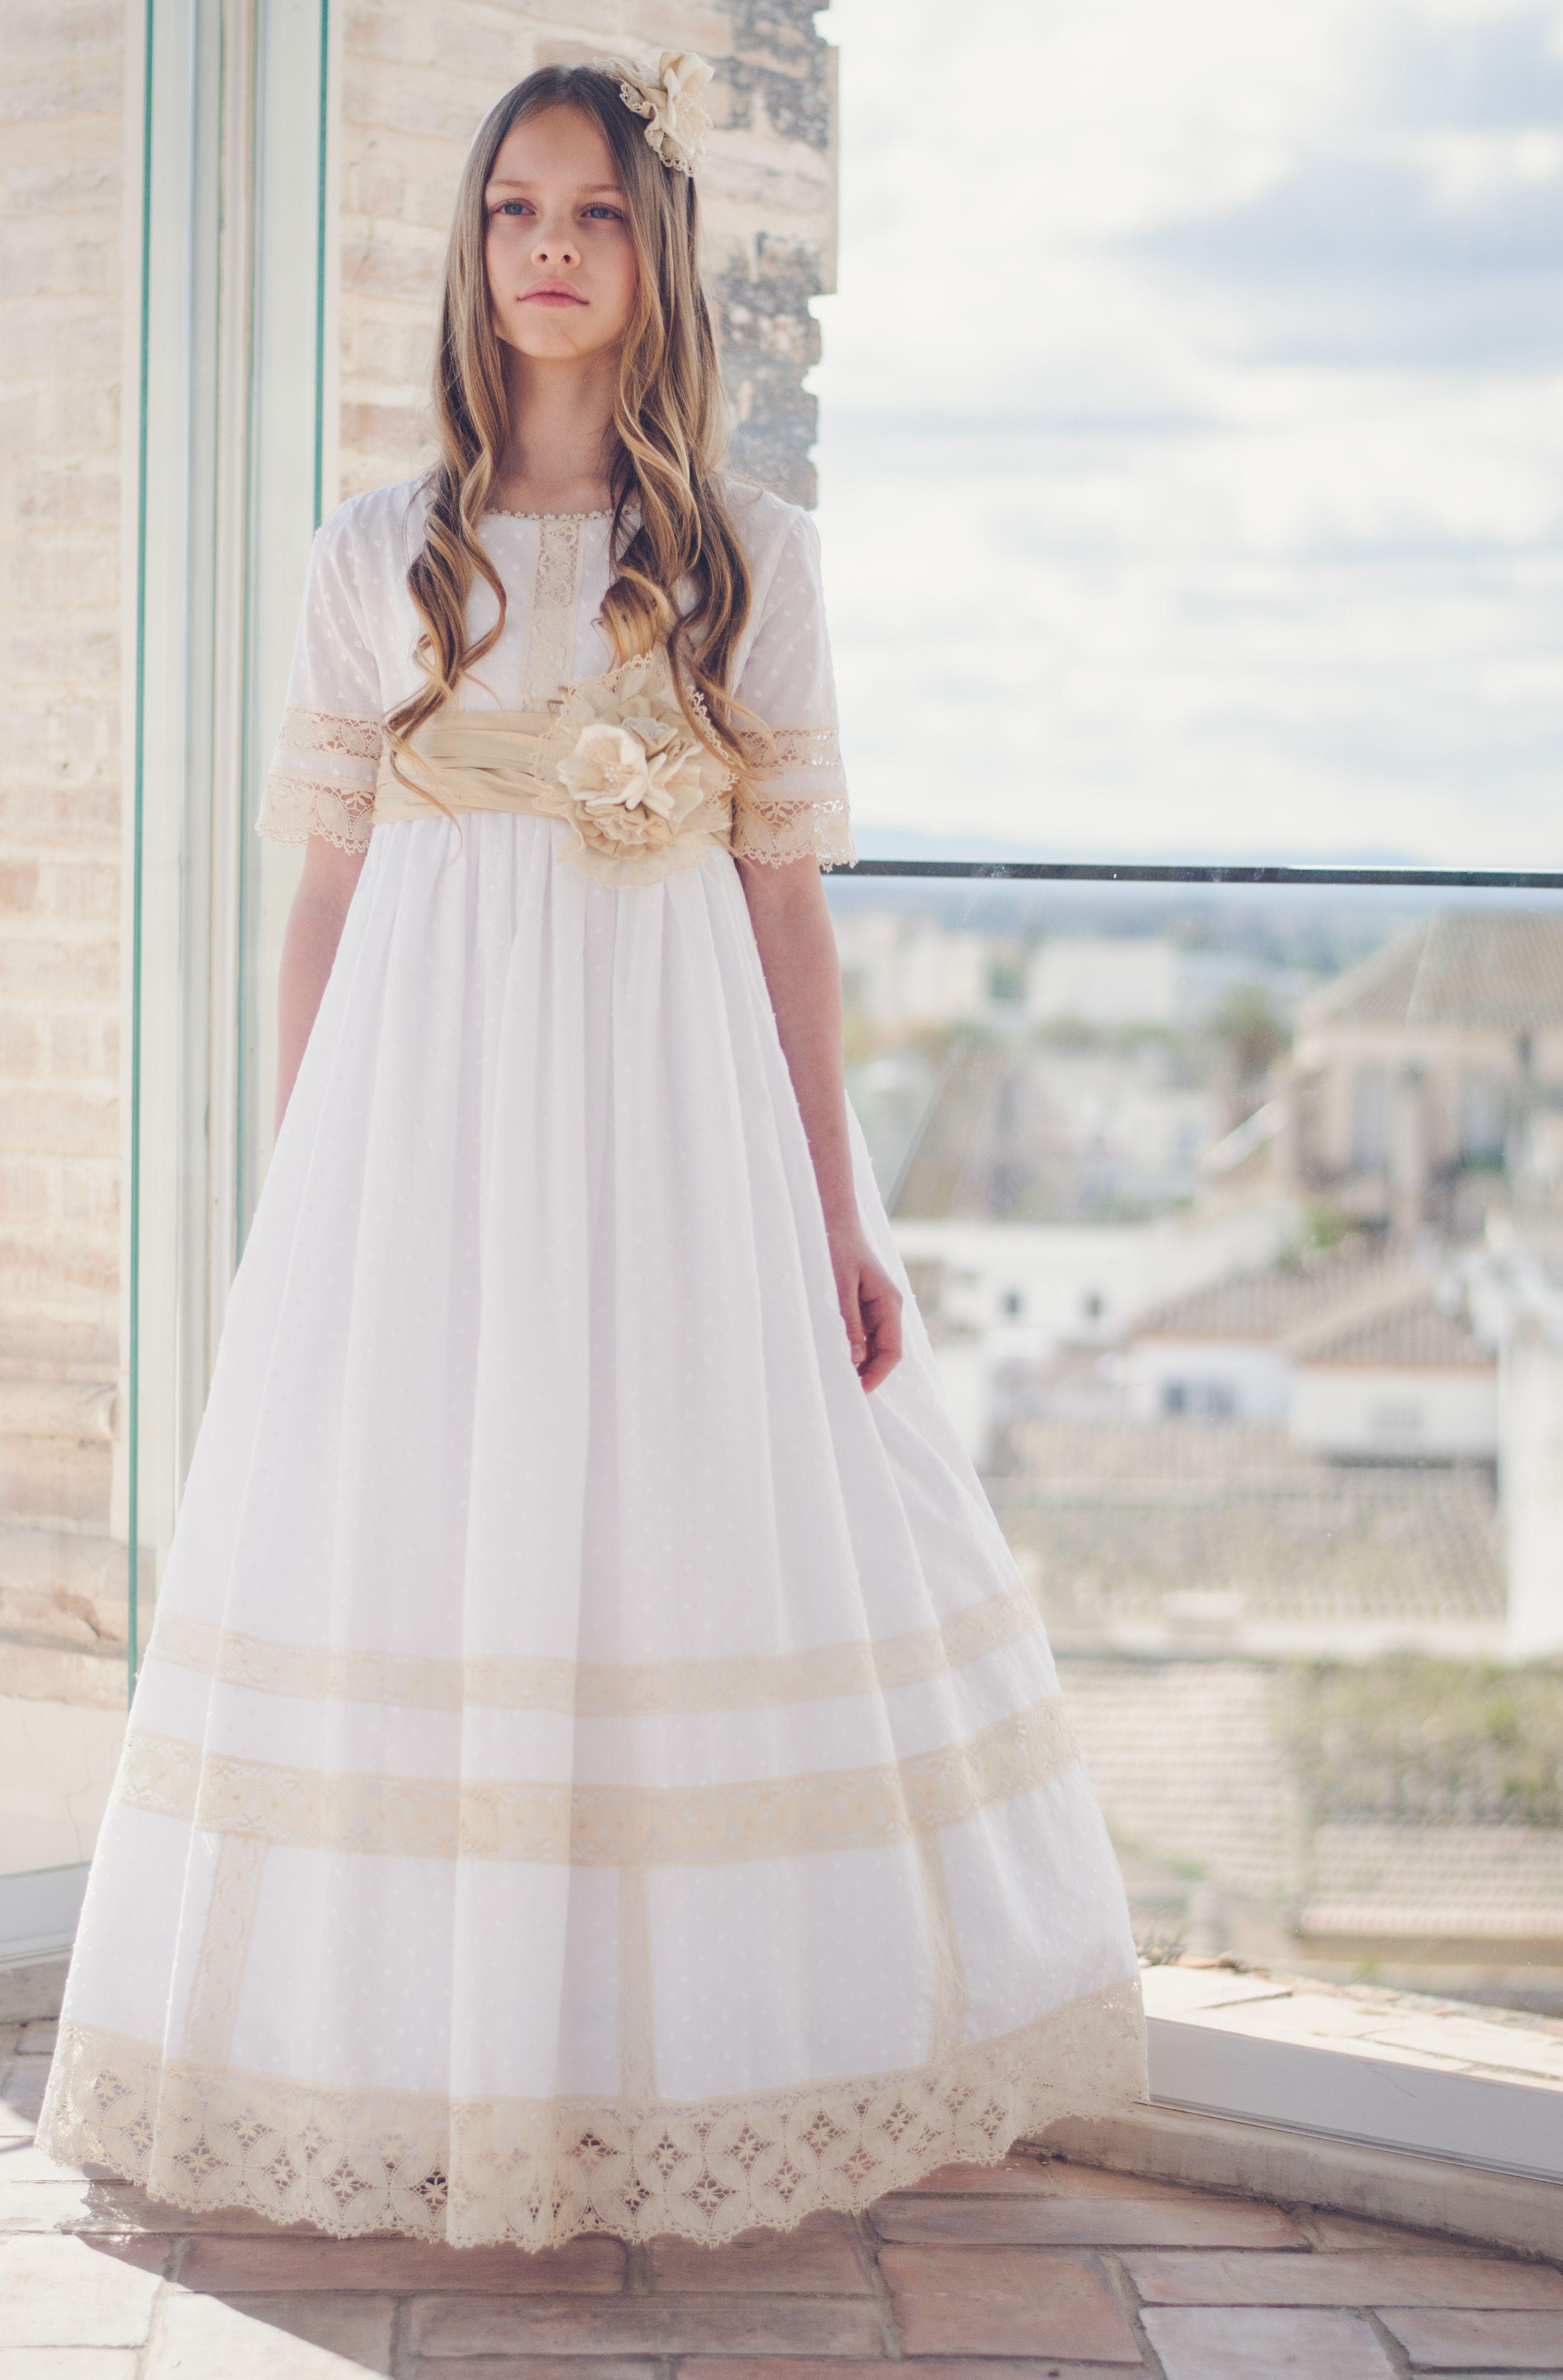 La Ormiga 2017 Flower Girl Dresses Wedding Dresses Dresses